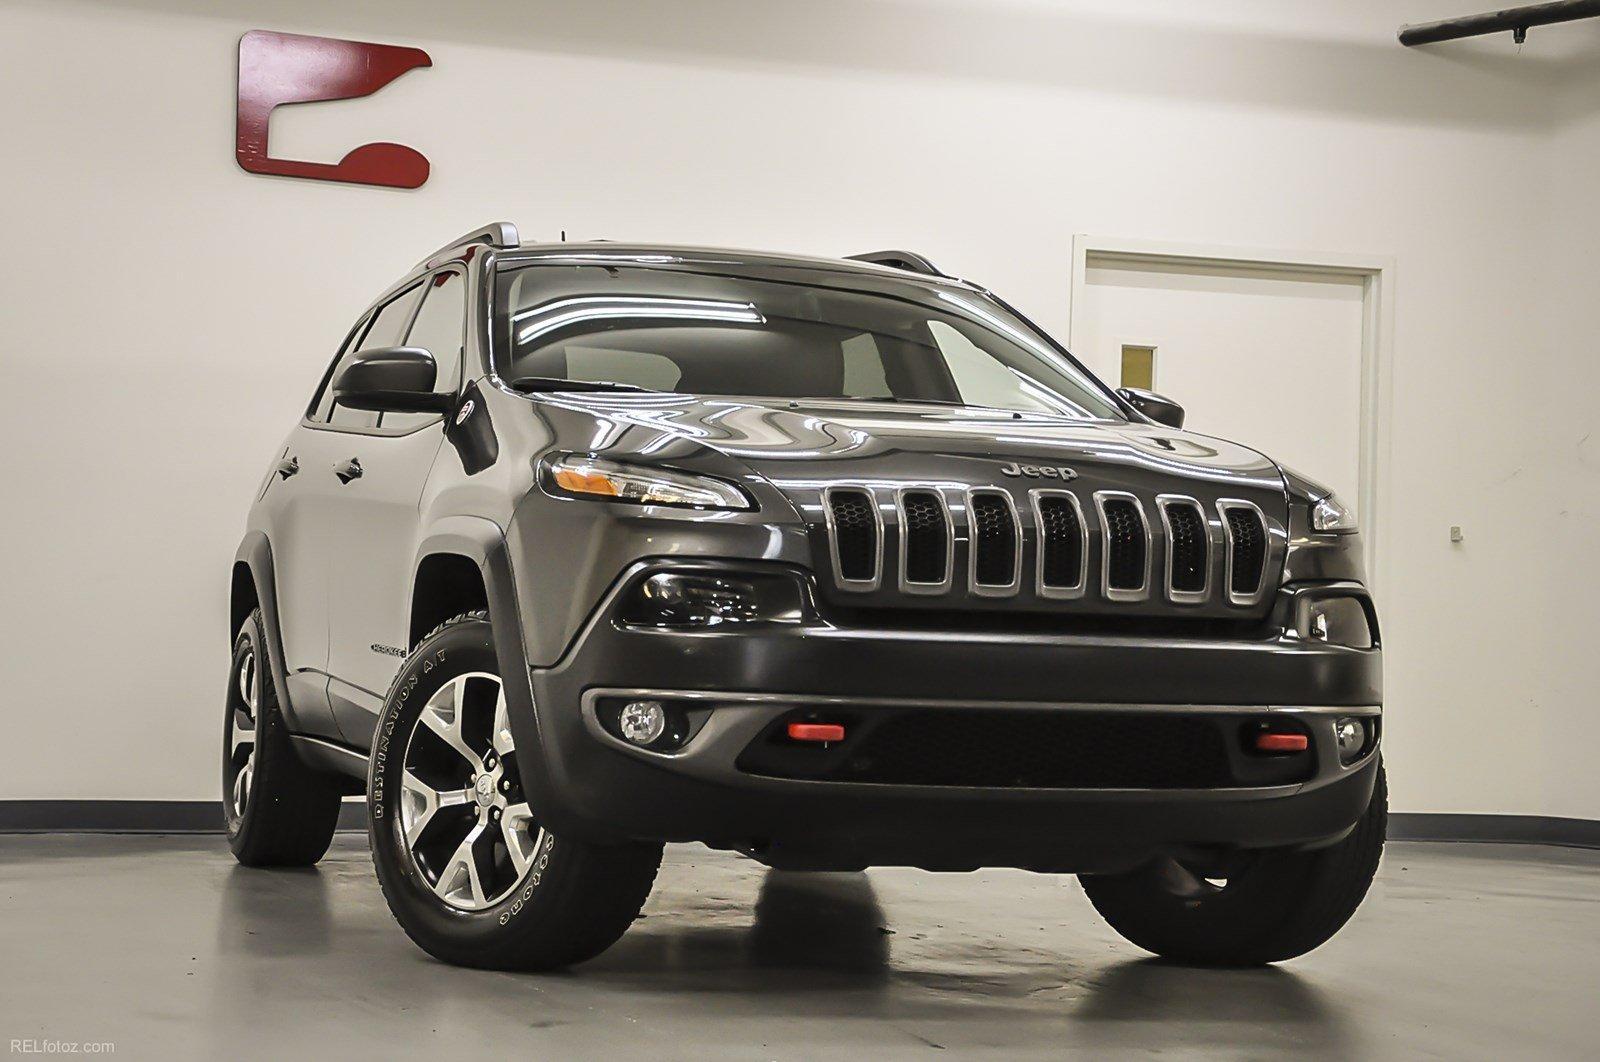 2015 Jeep Cherokee Trailhawk Stock 603004 For Sale Near Marietta Hitch Wiring Harness Ga Used